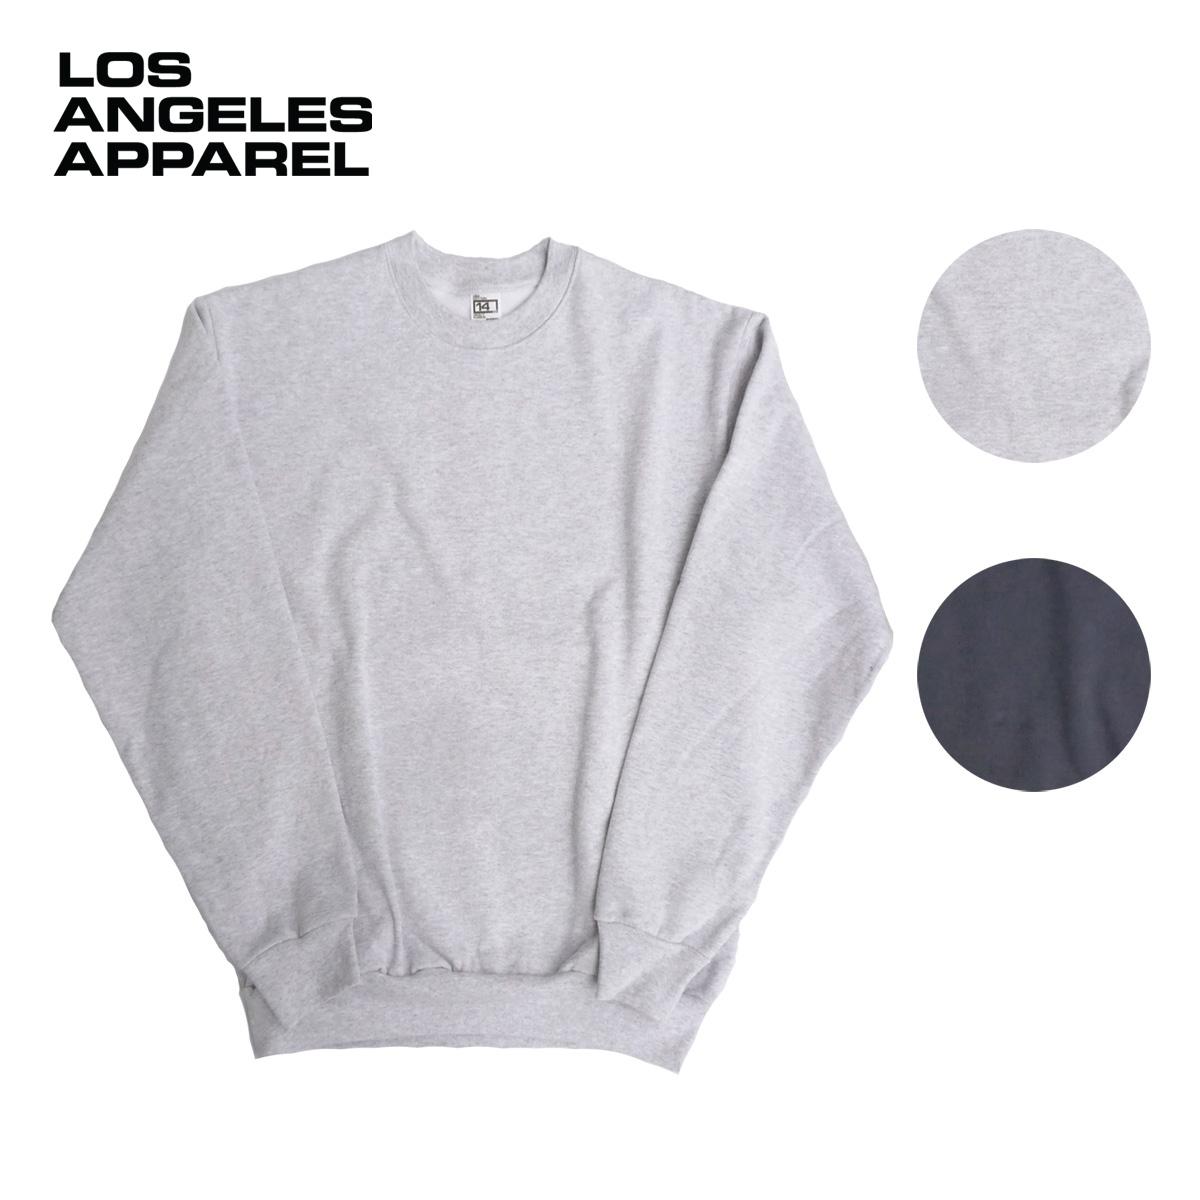 LOS ANGELES APPAREL ロサンゼルスアパレル 14oz SWEAT SHRTS